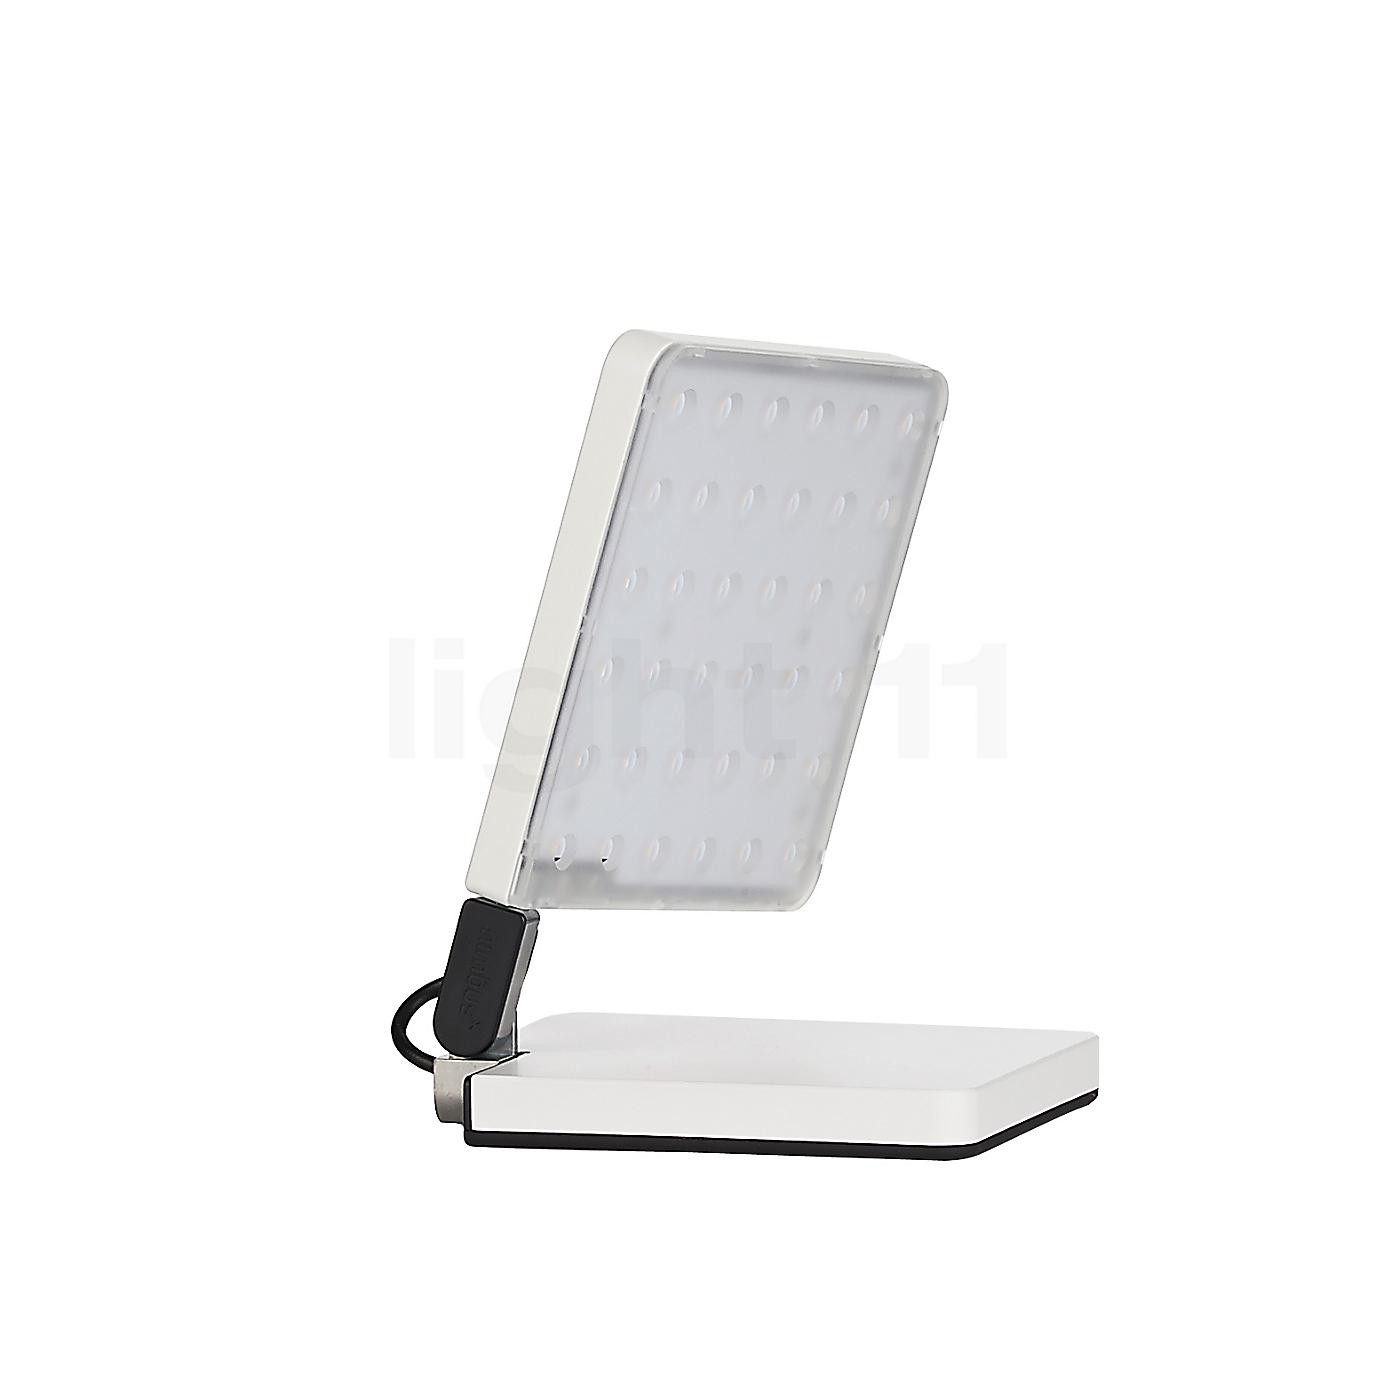 nimbus roxxane fly led tischleuchte kaufen bei. Black Bedroom Furniture Sets. Home Design Ideas